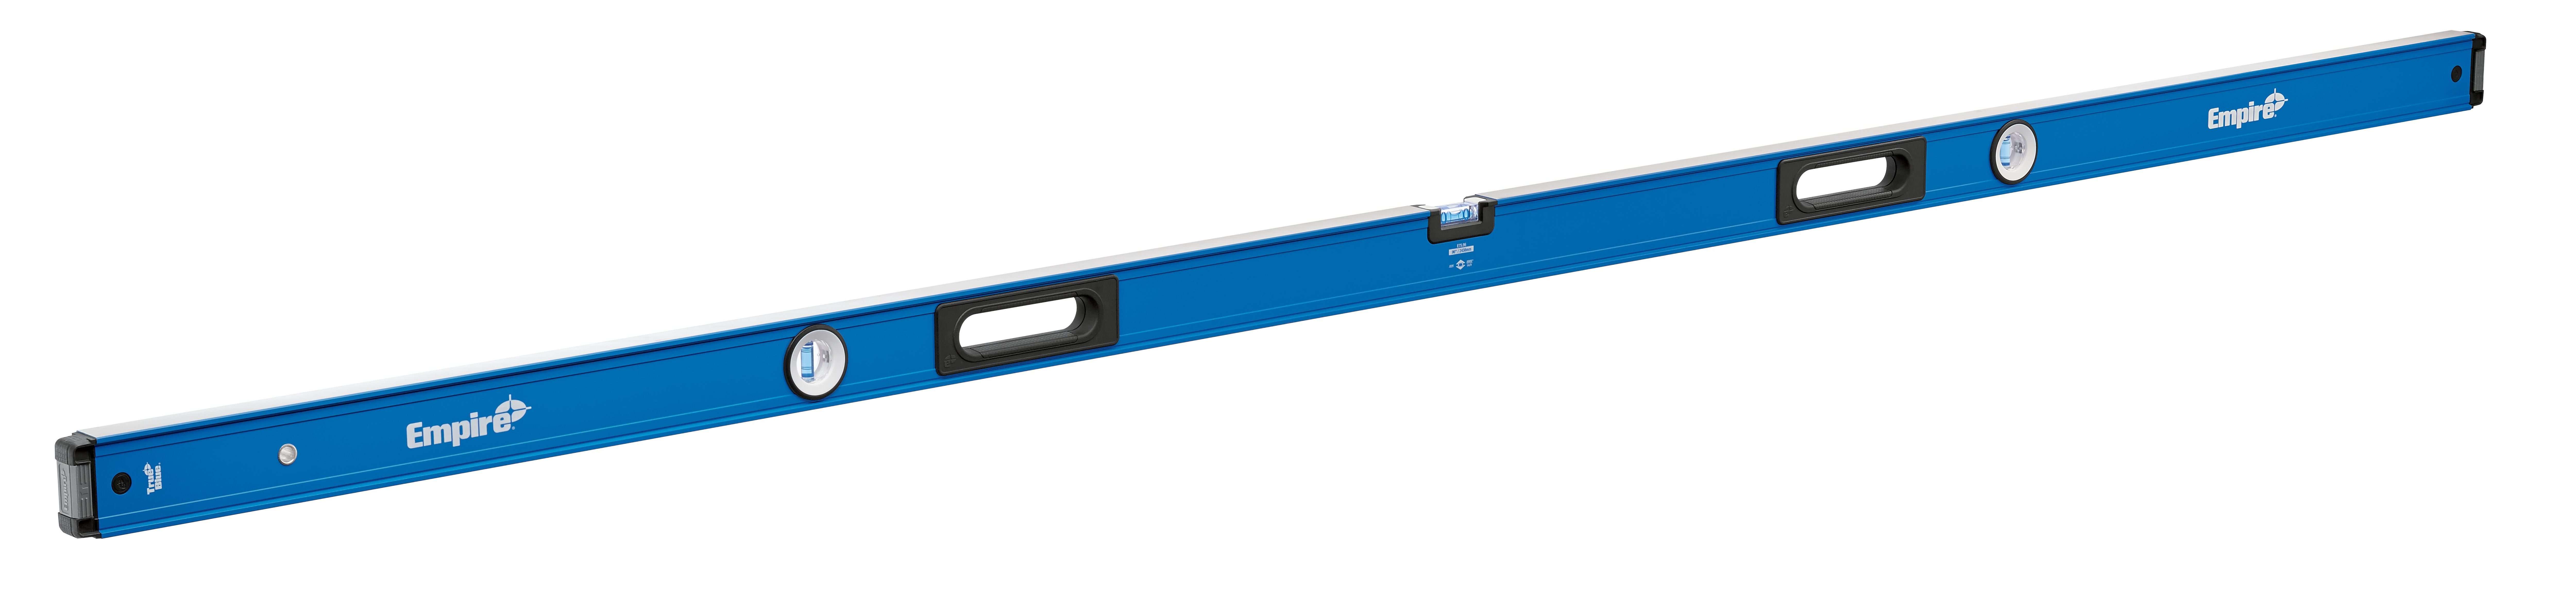 Milwaukee® Empire® TRUE BLUE® E75.96 E75 Box Level, 96 in L, 3 Vials, Aluminum, (1) Level, (2) Plumb Vial Position, 0.0005 in/in Accuracy